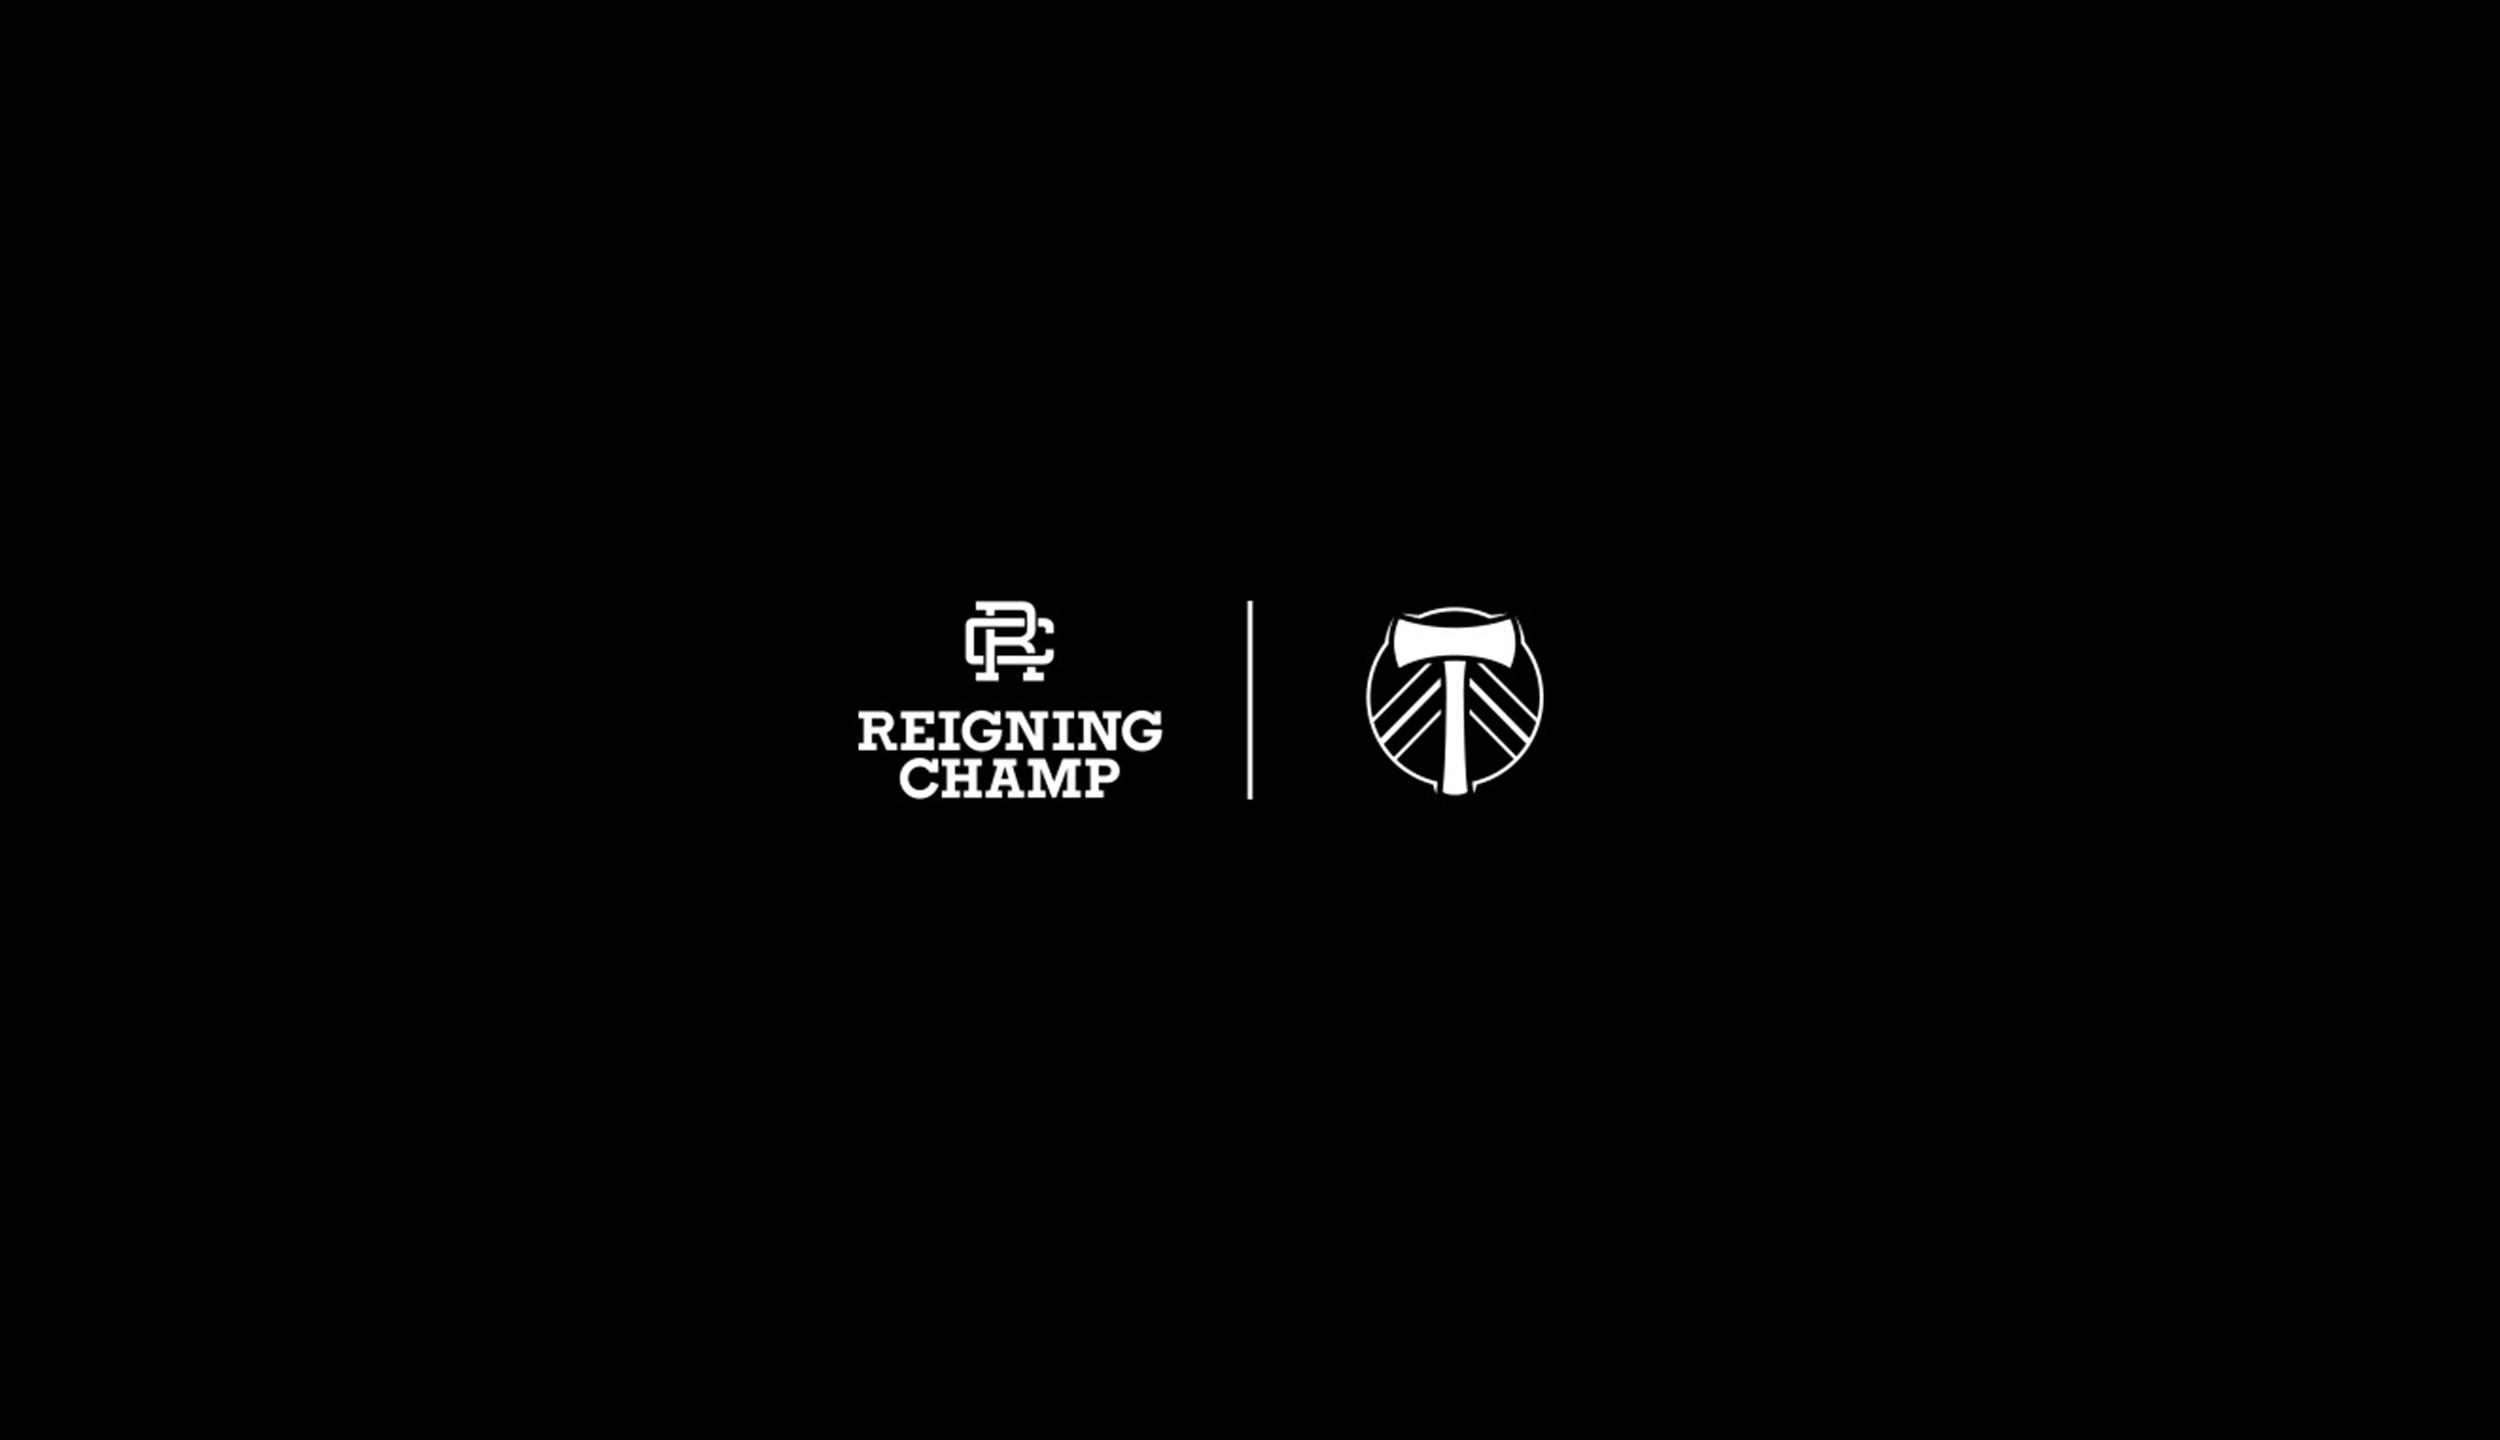 AntonioBrasko-ReigningChamp-PortlandTimbers-ChampionsPack-MLS-Soccer.jpg